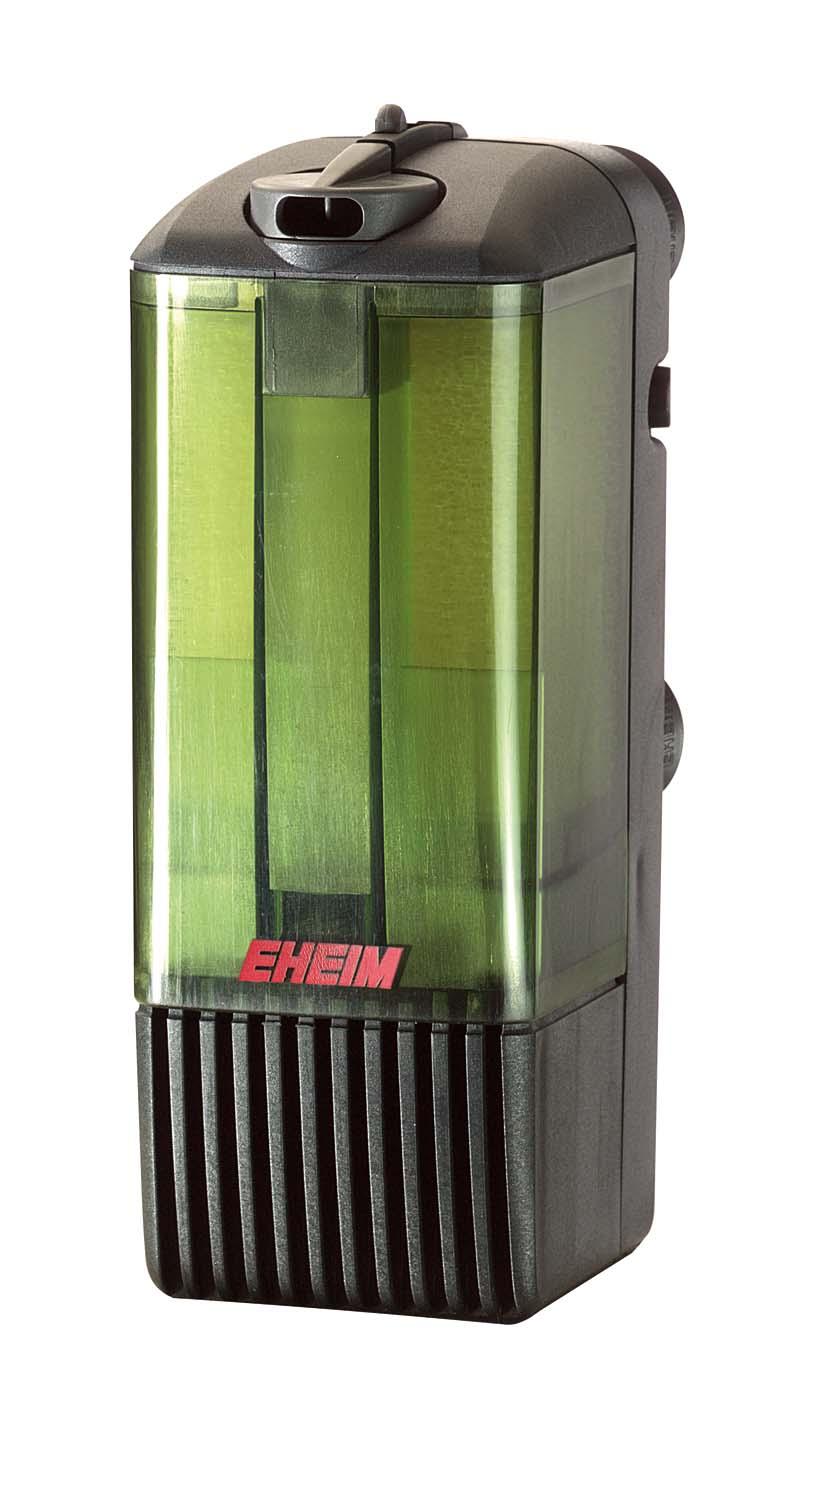 EHEIM pickup 45 (2006)